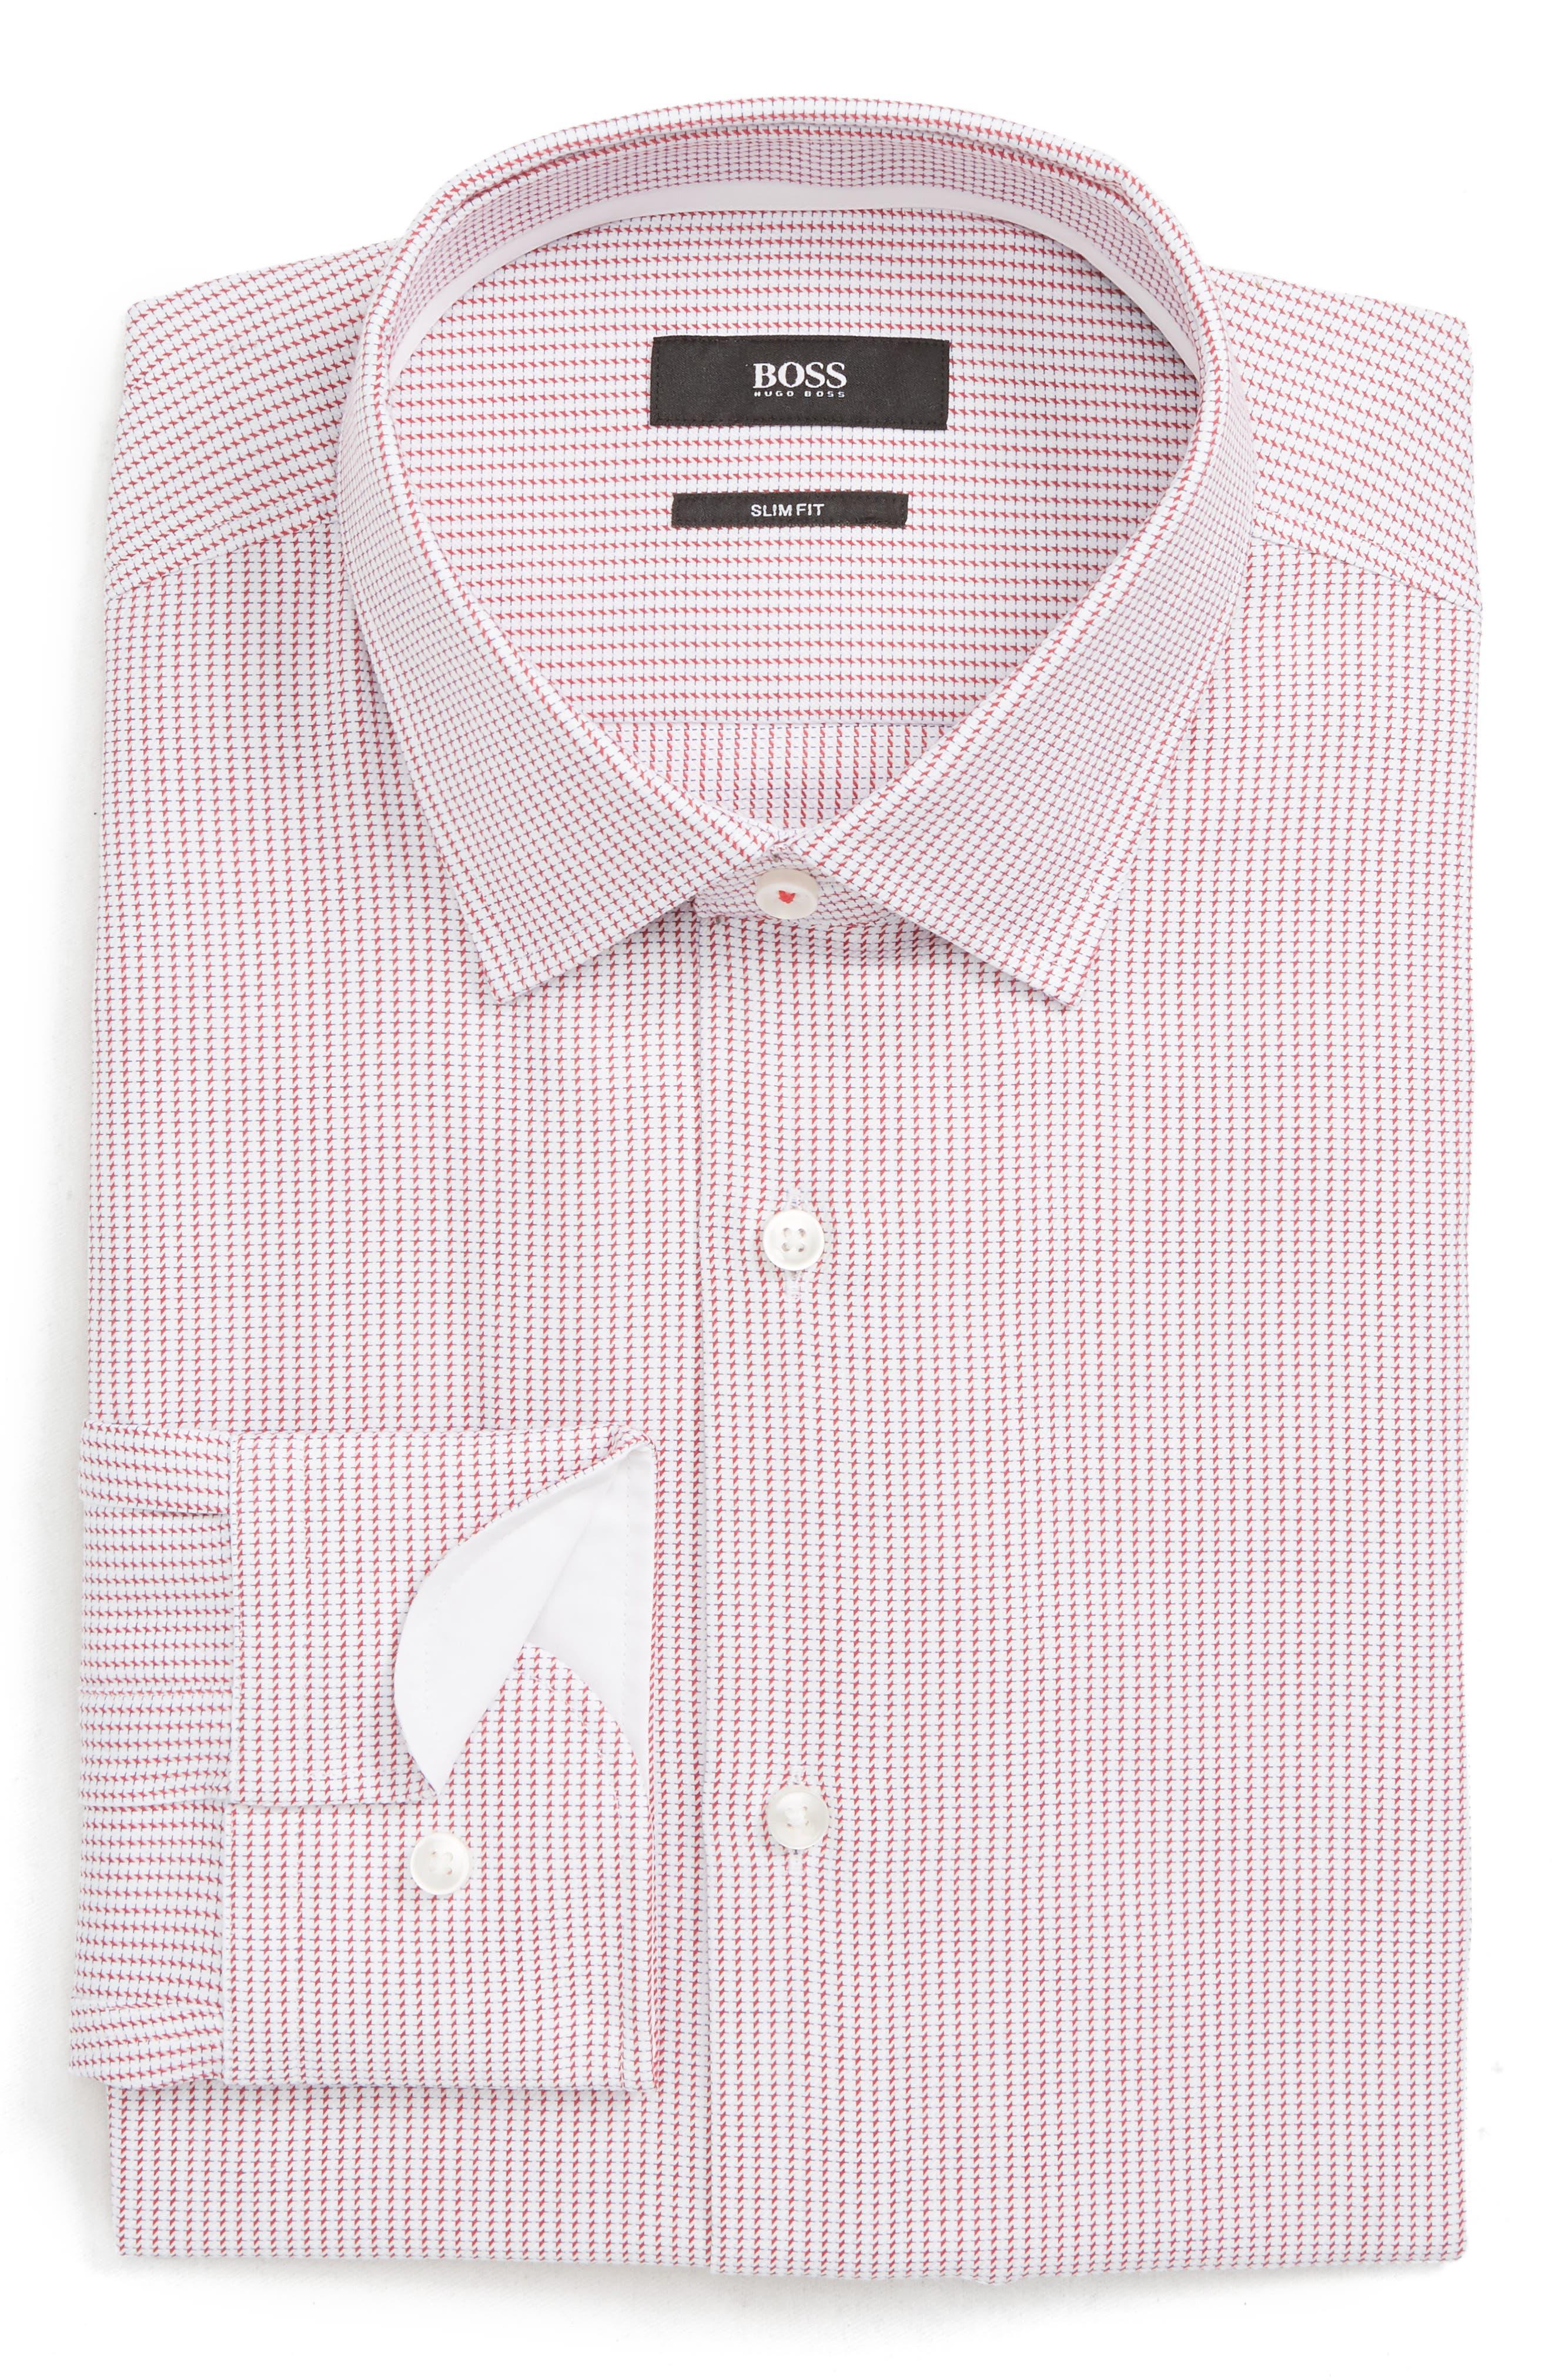 Jesse Slim Fit Print Dress Shirt,                             Main thumbnail 1, color,                             DARK PINK